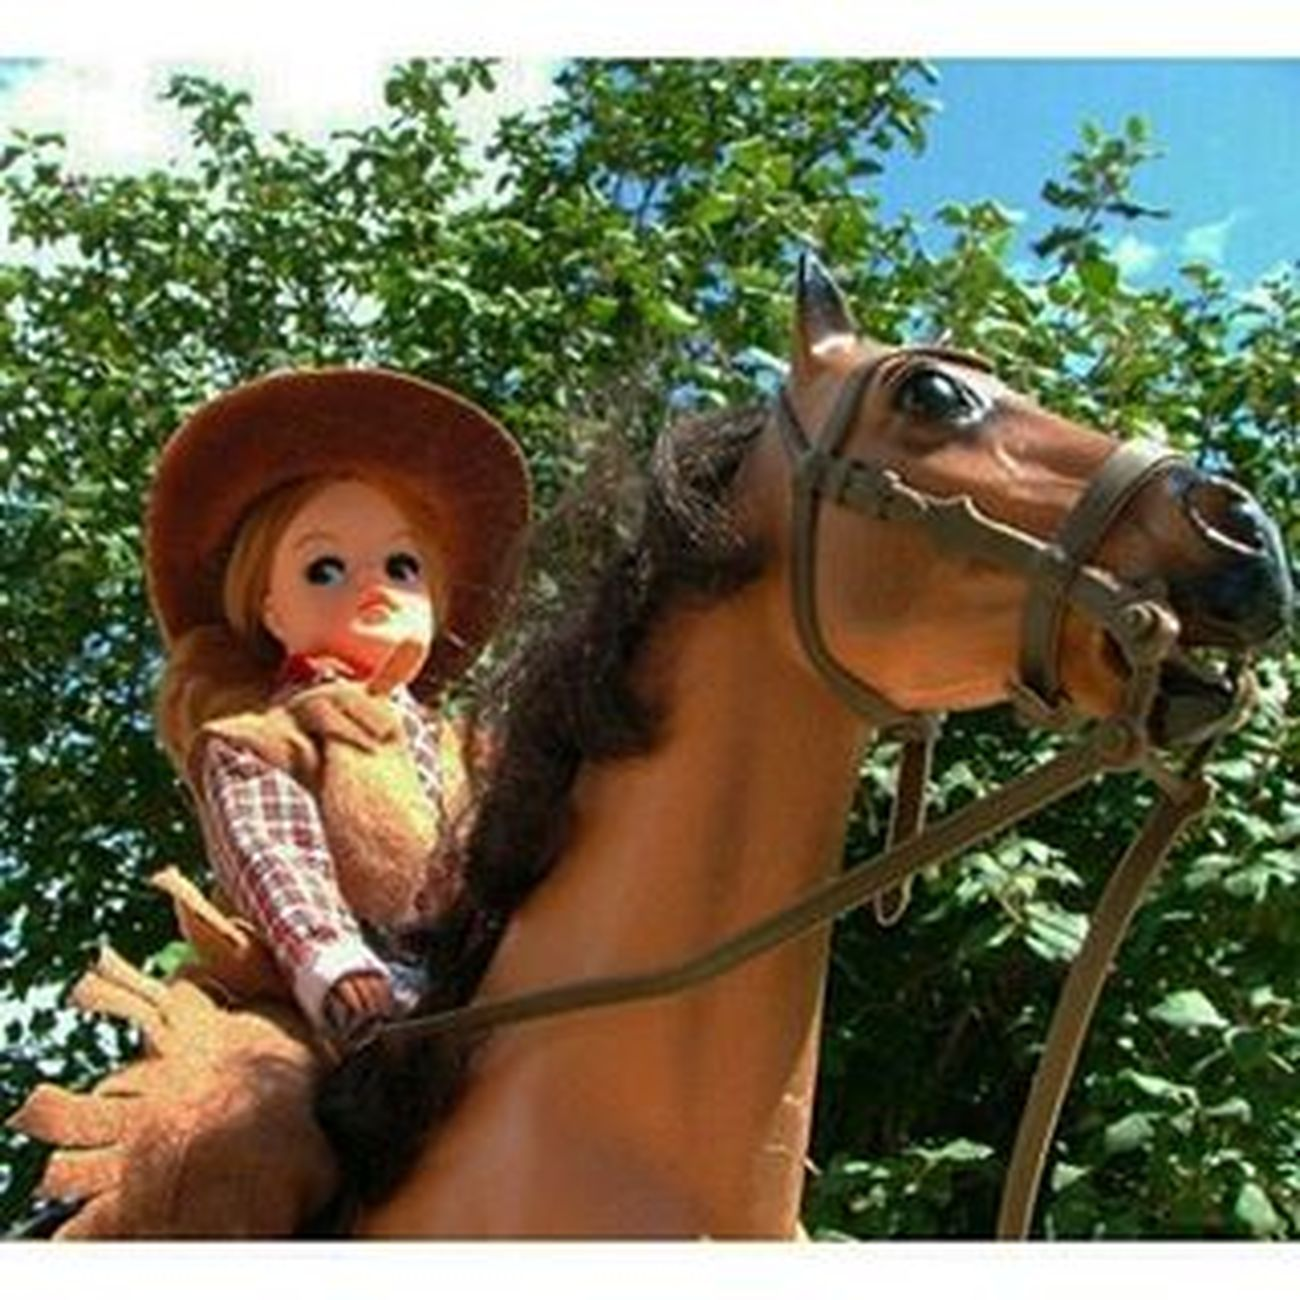 Howdy from Western Sindy . Giddyap ! ************* Doll Dolls Dollstagram Dollphotogallery DollPhotography Toy Toys Toygroup_alliance Toyartistry Toyphotogallery Toyphotography Toyunion Toyplanet Toys4life Toyslagram Toyrevolution Toycrewbuddies Ata_dreadnoughts Sindydoll Marxtoys Pedigree Vintagetoys vintage uktoymafia horse riding cowboy